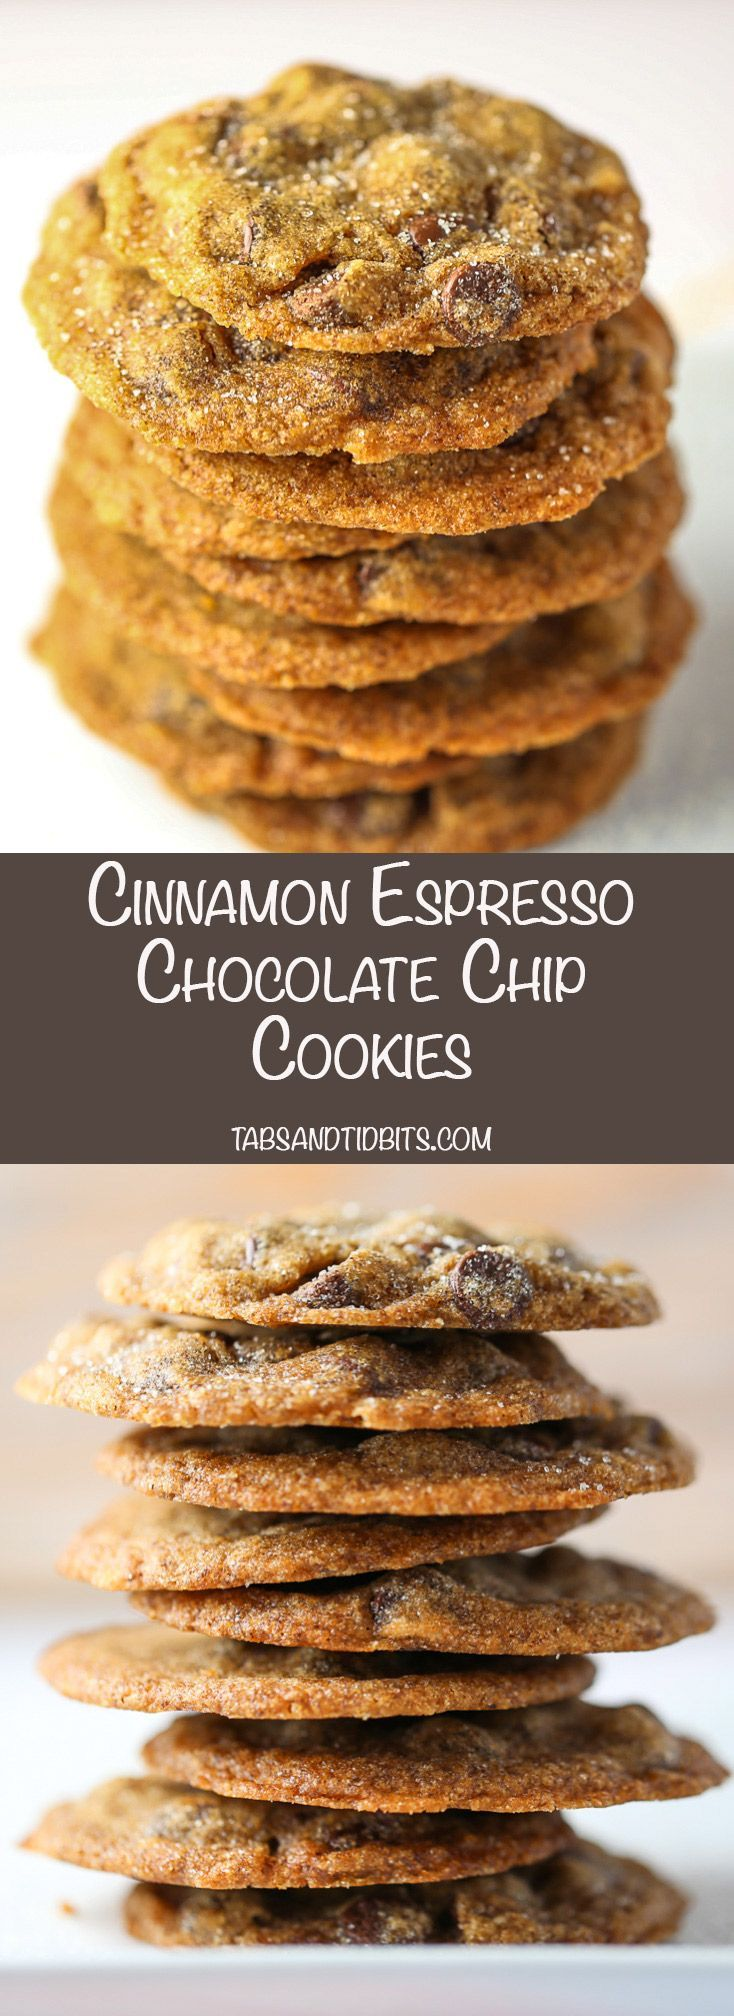 Cinnamon Expresso Chocolate Chip Cookies -Chocolate chip cookies with espresso and a sprinkle of cinnamon.